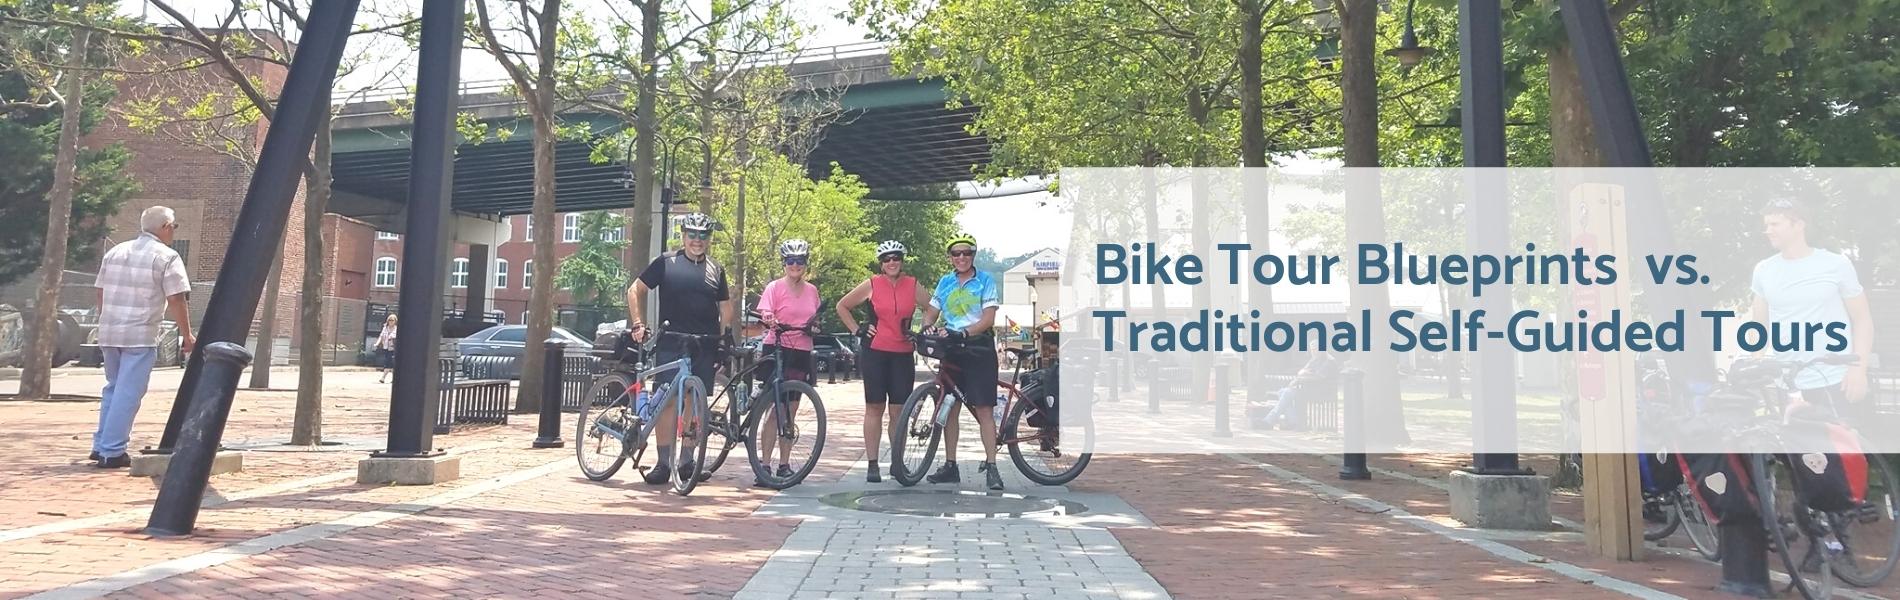 blueprints vs self guided bike tours